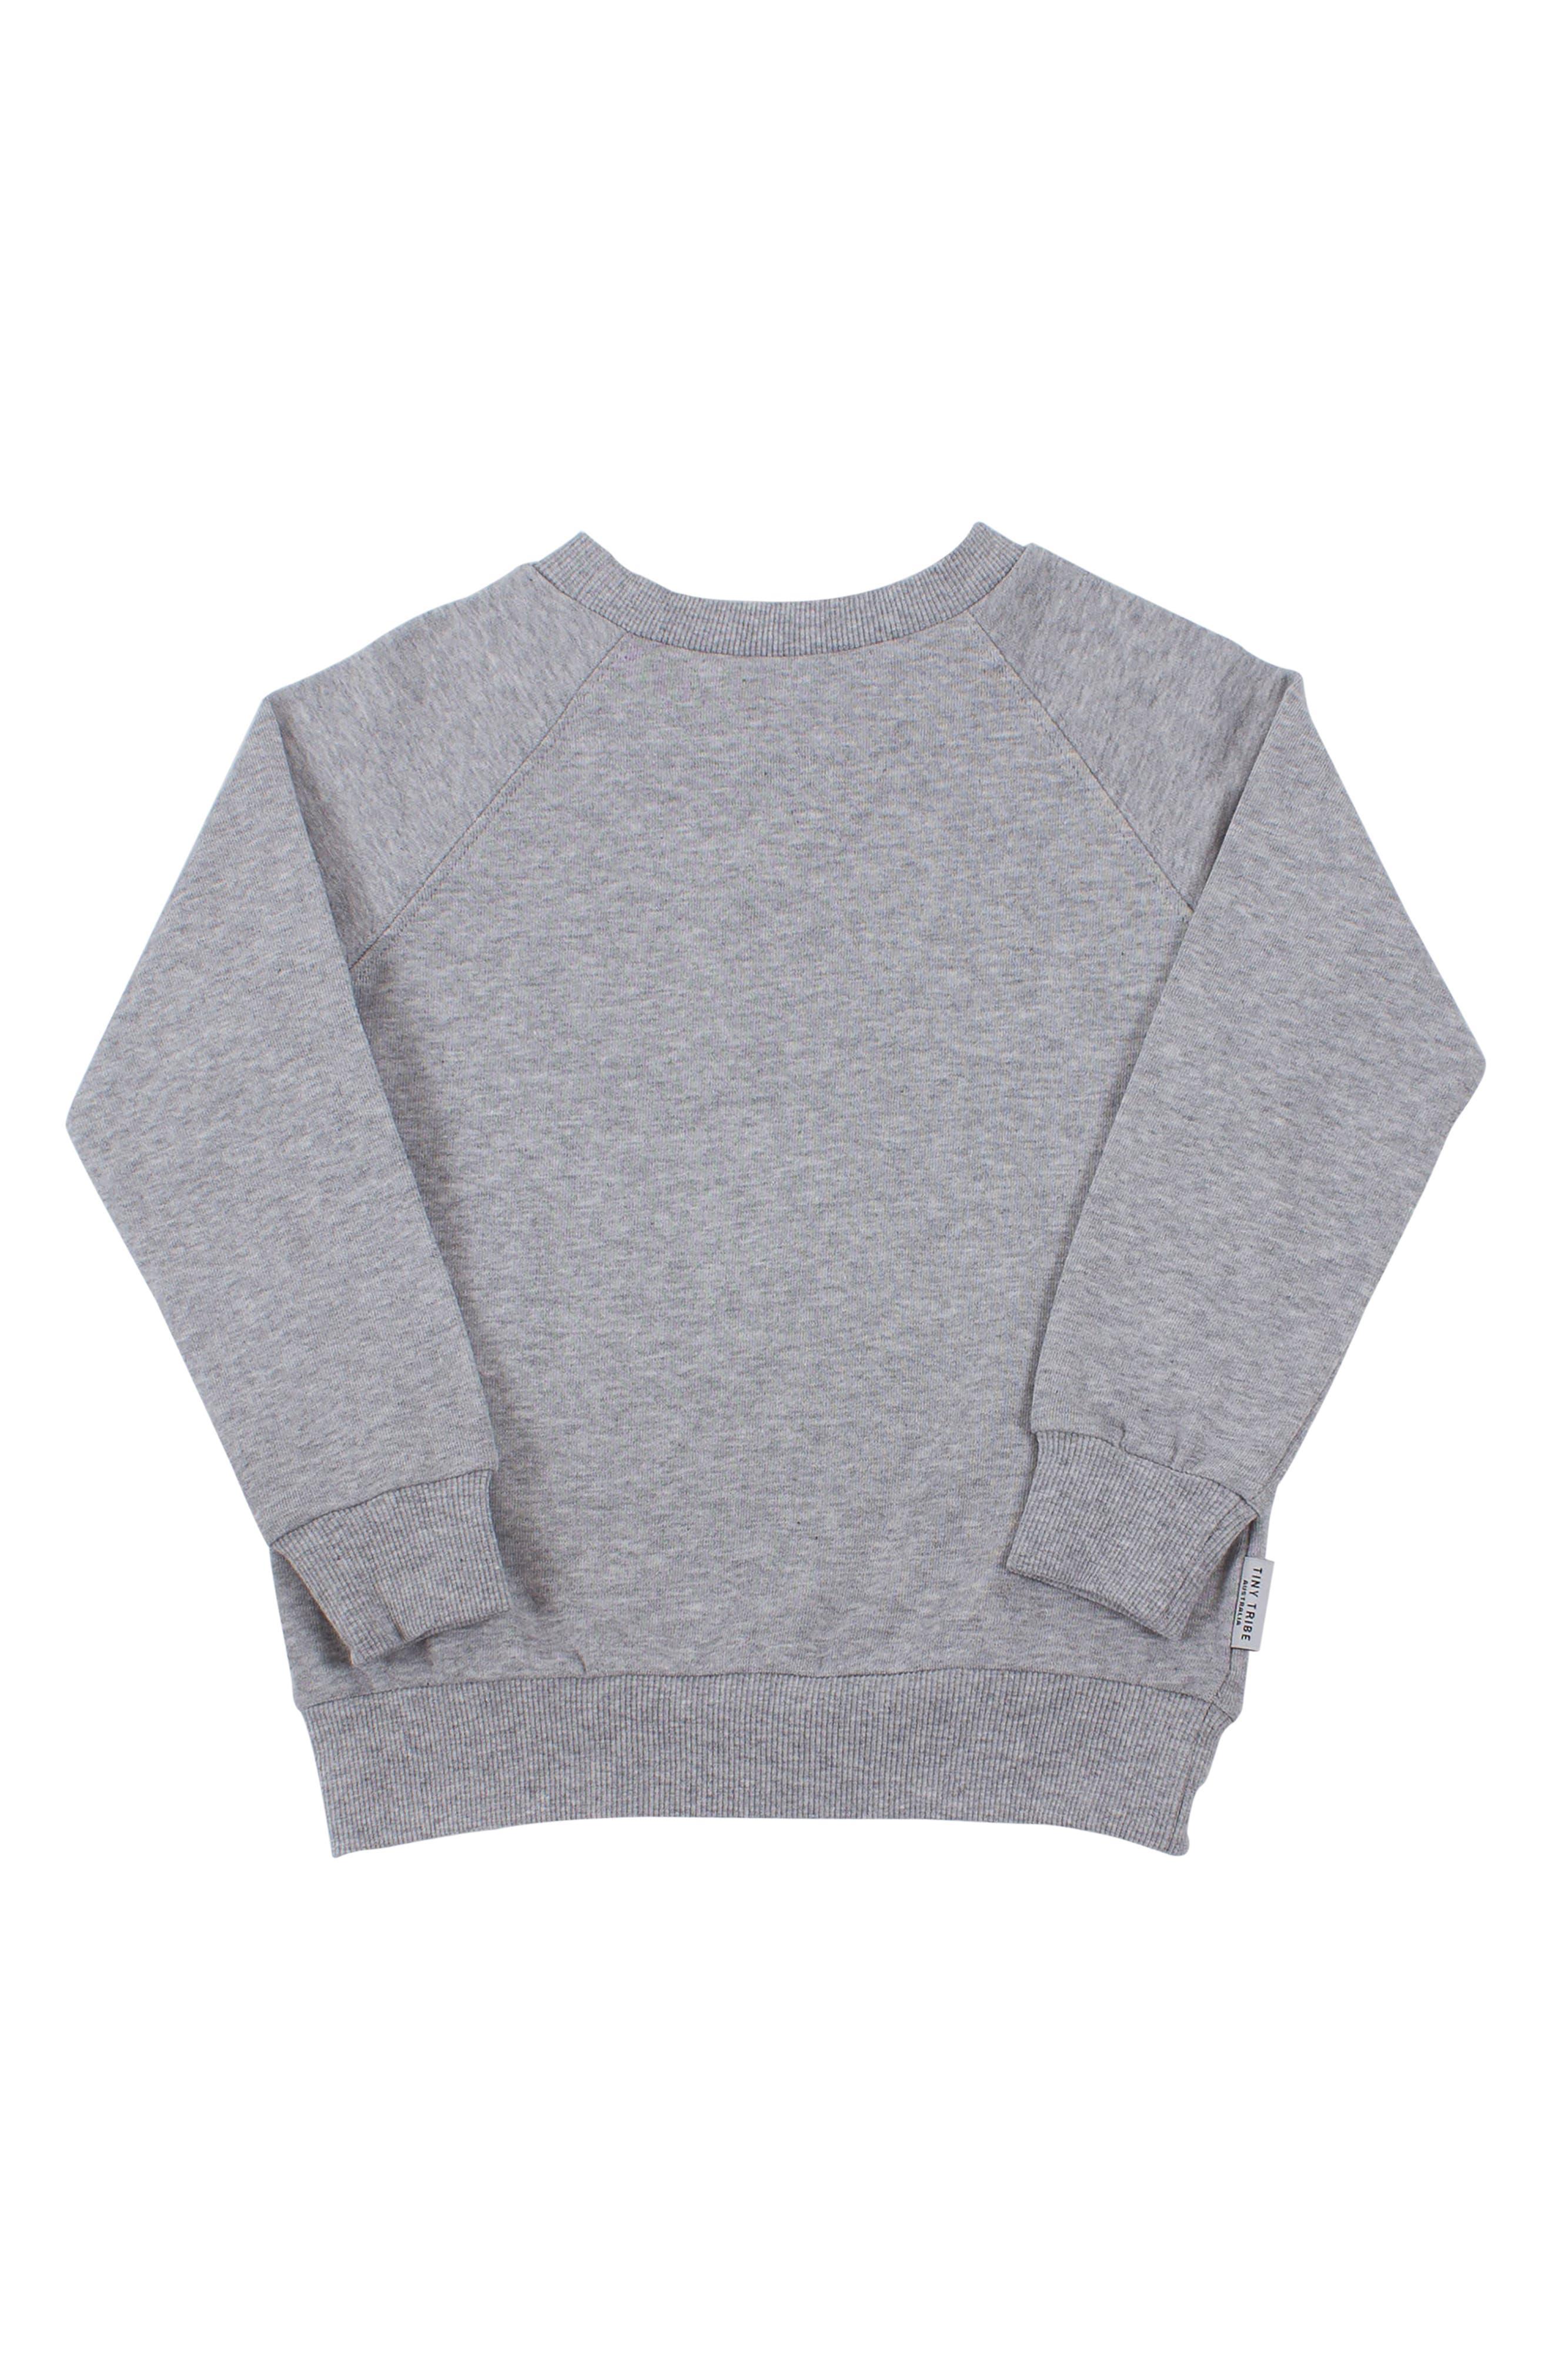 Graphic Sweatshirt,                             Alternate thumbnail 2, color,                             020